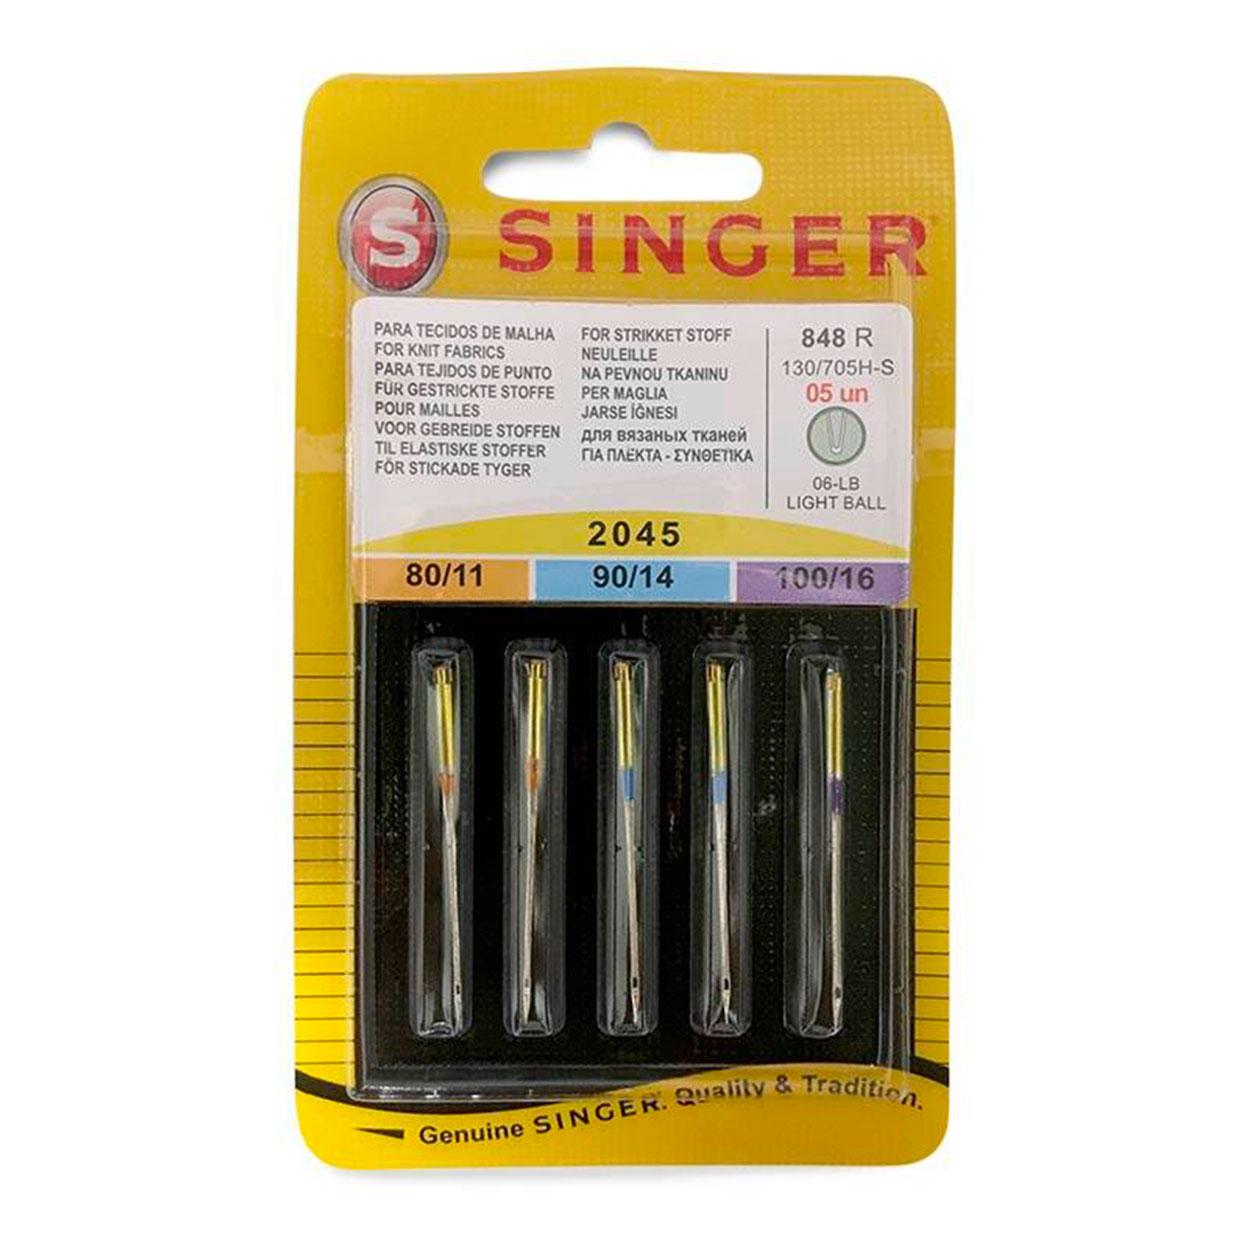 Aghi Singer Per Maglia set 5 aghi